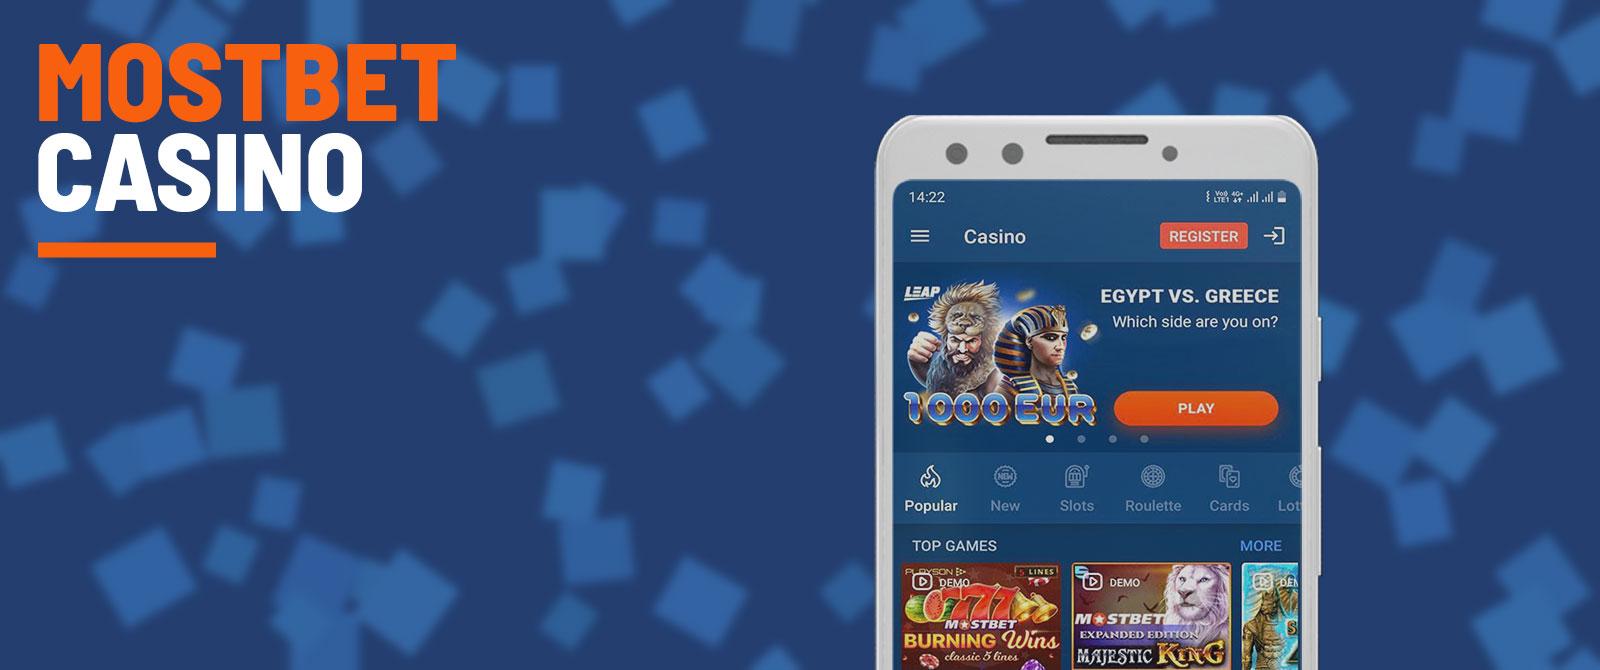 Mostbet casino platform.